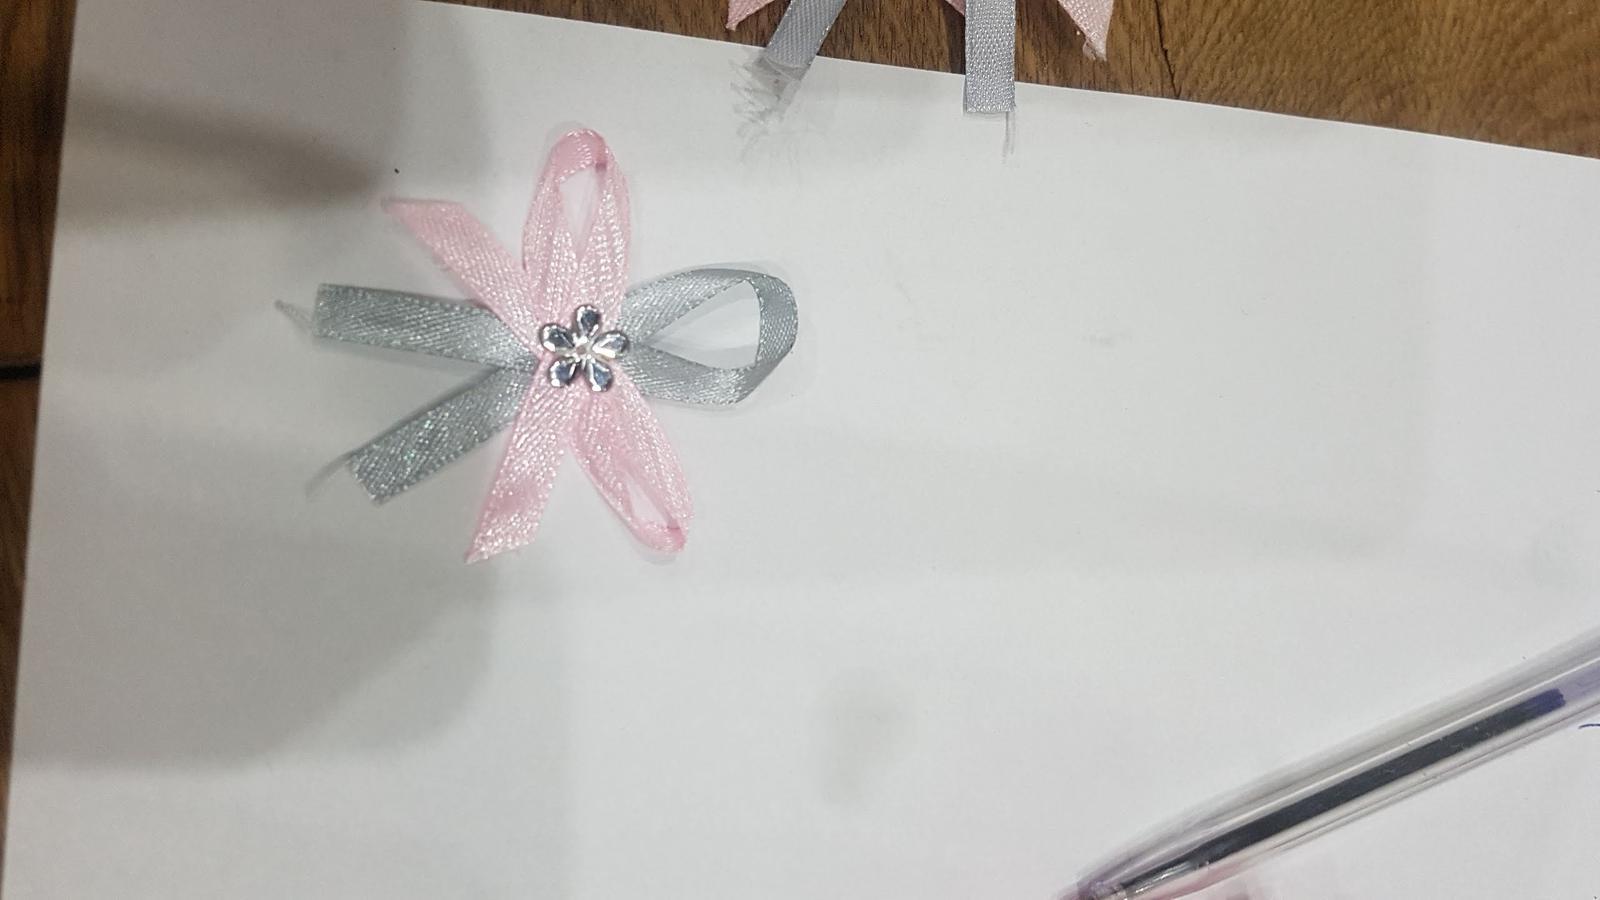 Šedo růžové vývazky s kytičkou - Obrázek č. 2